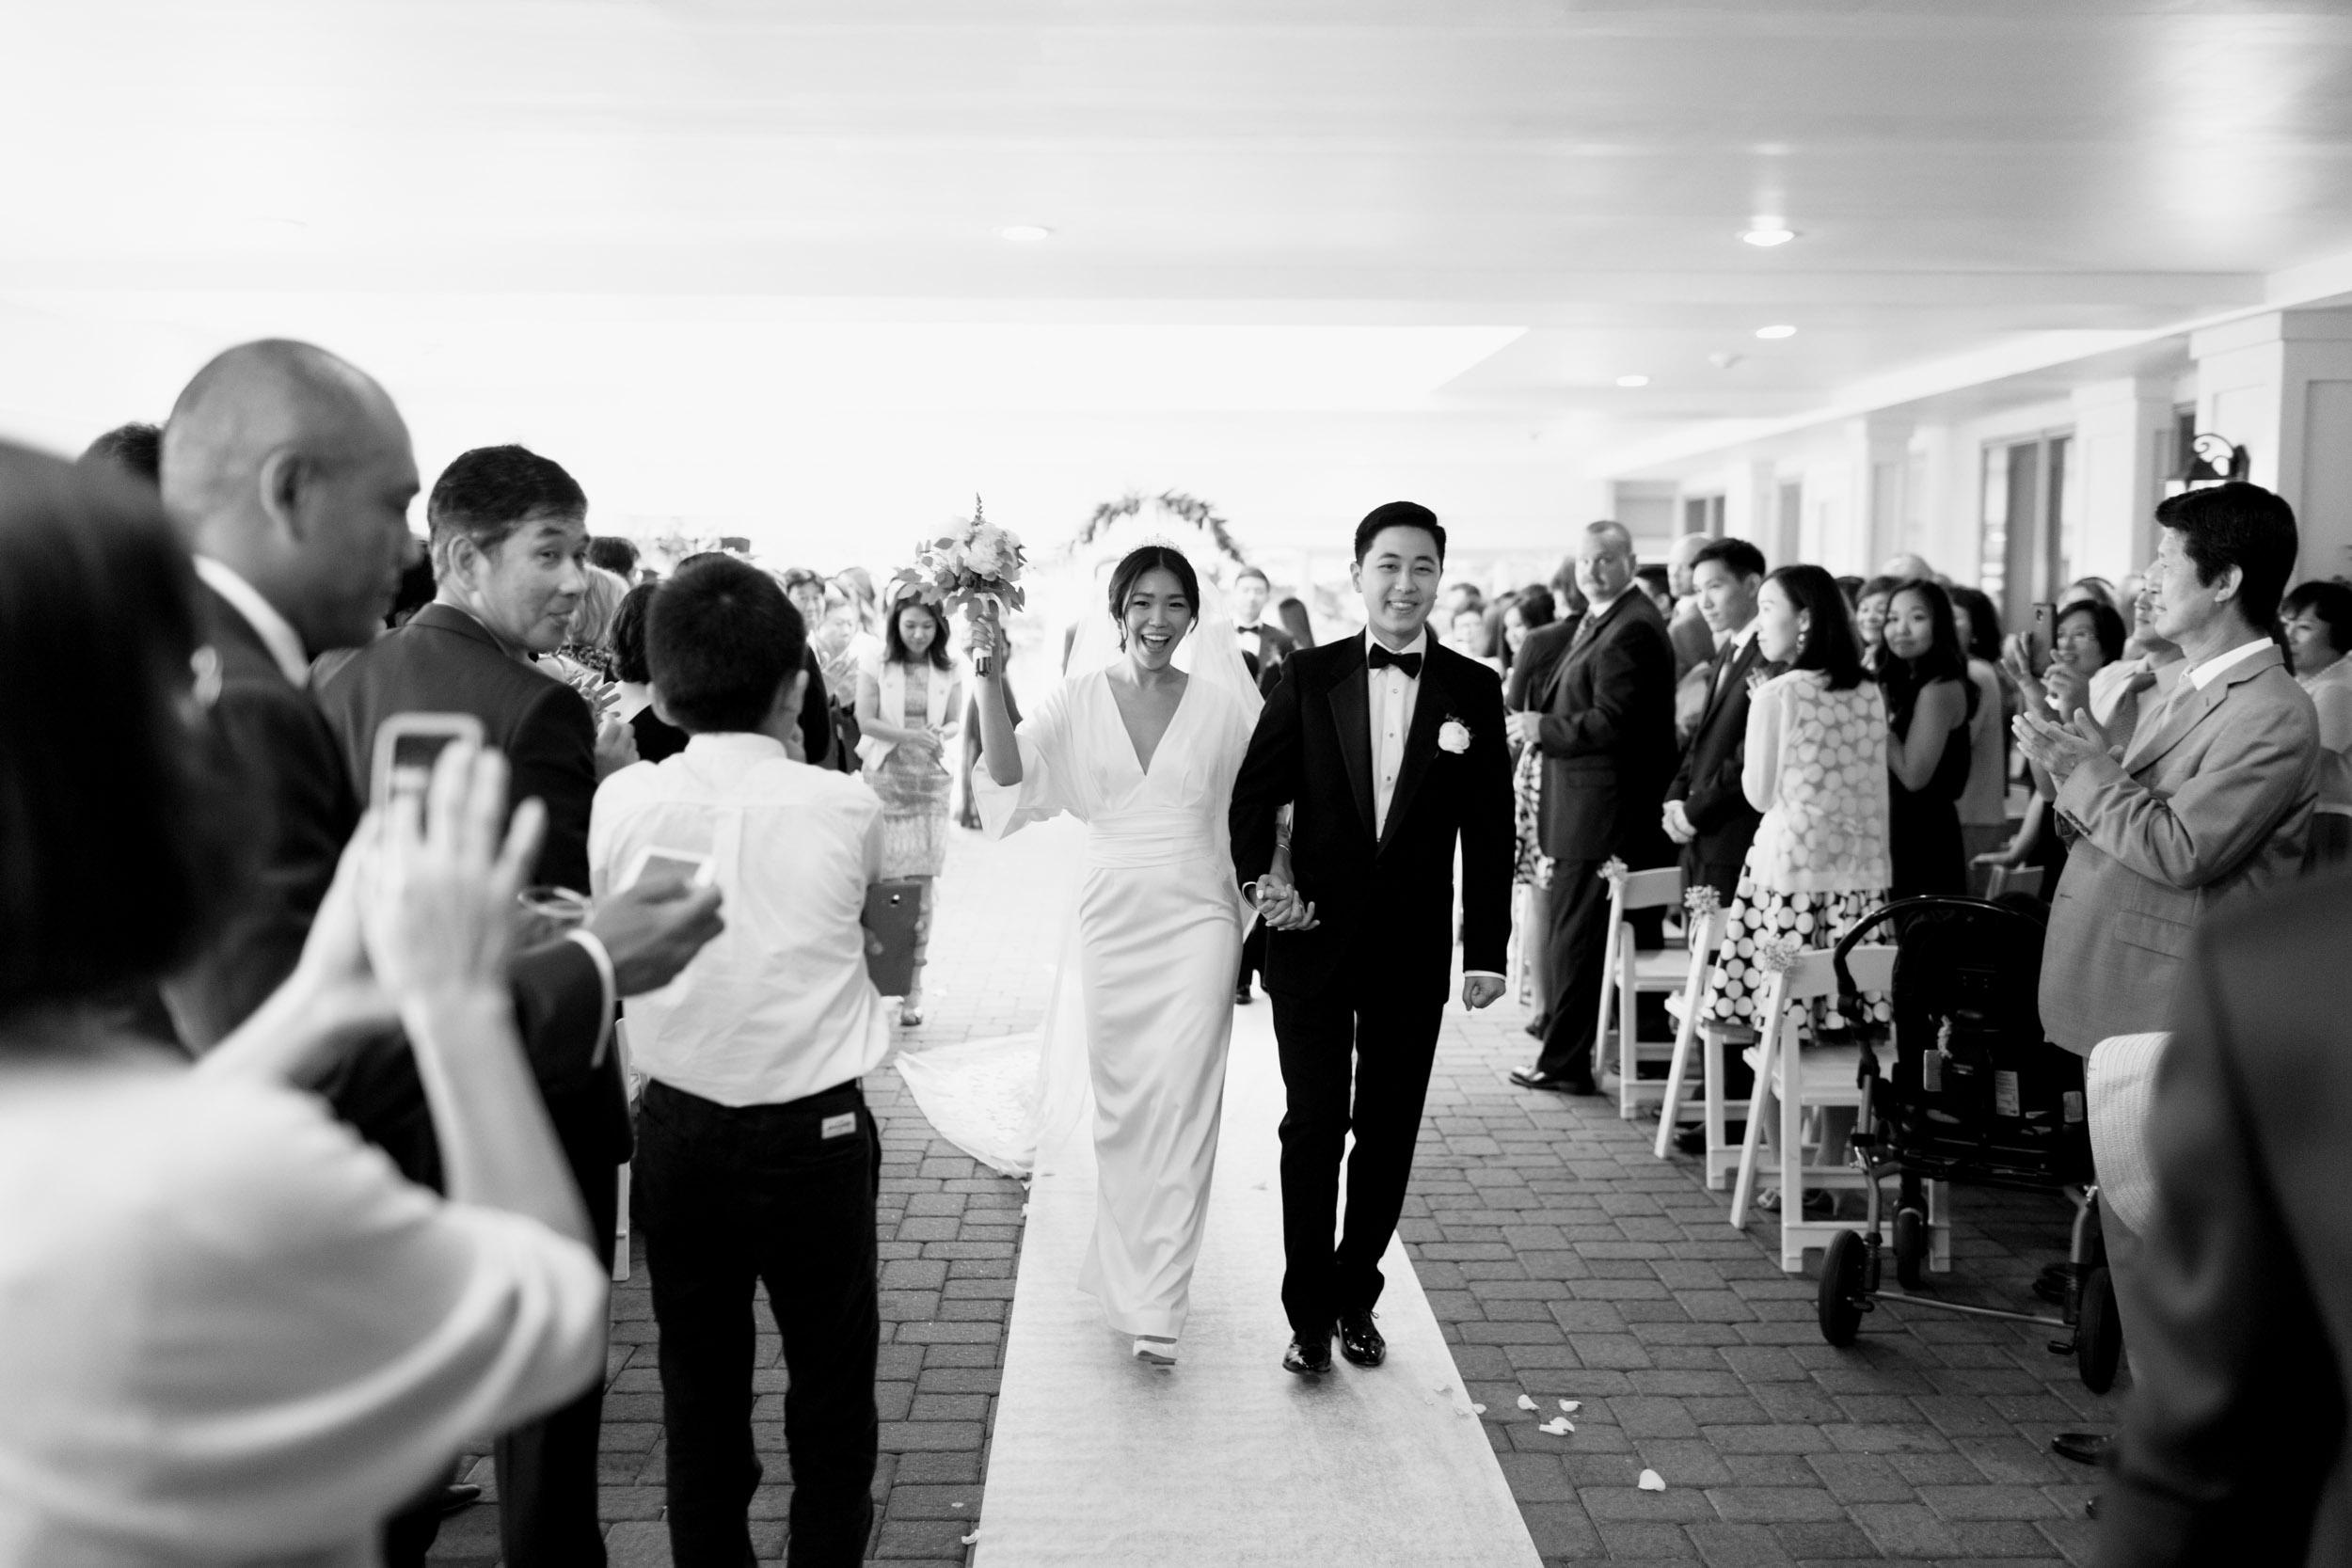 jean-arnold-wedding-0029.jpg